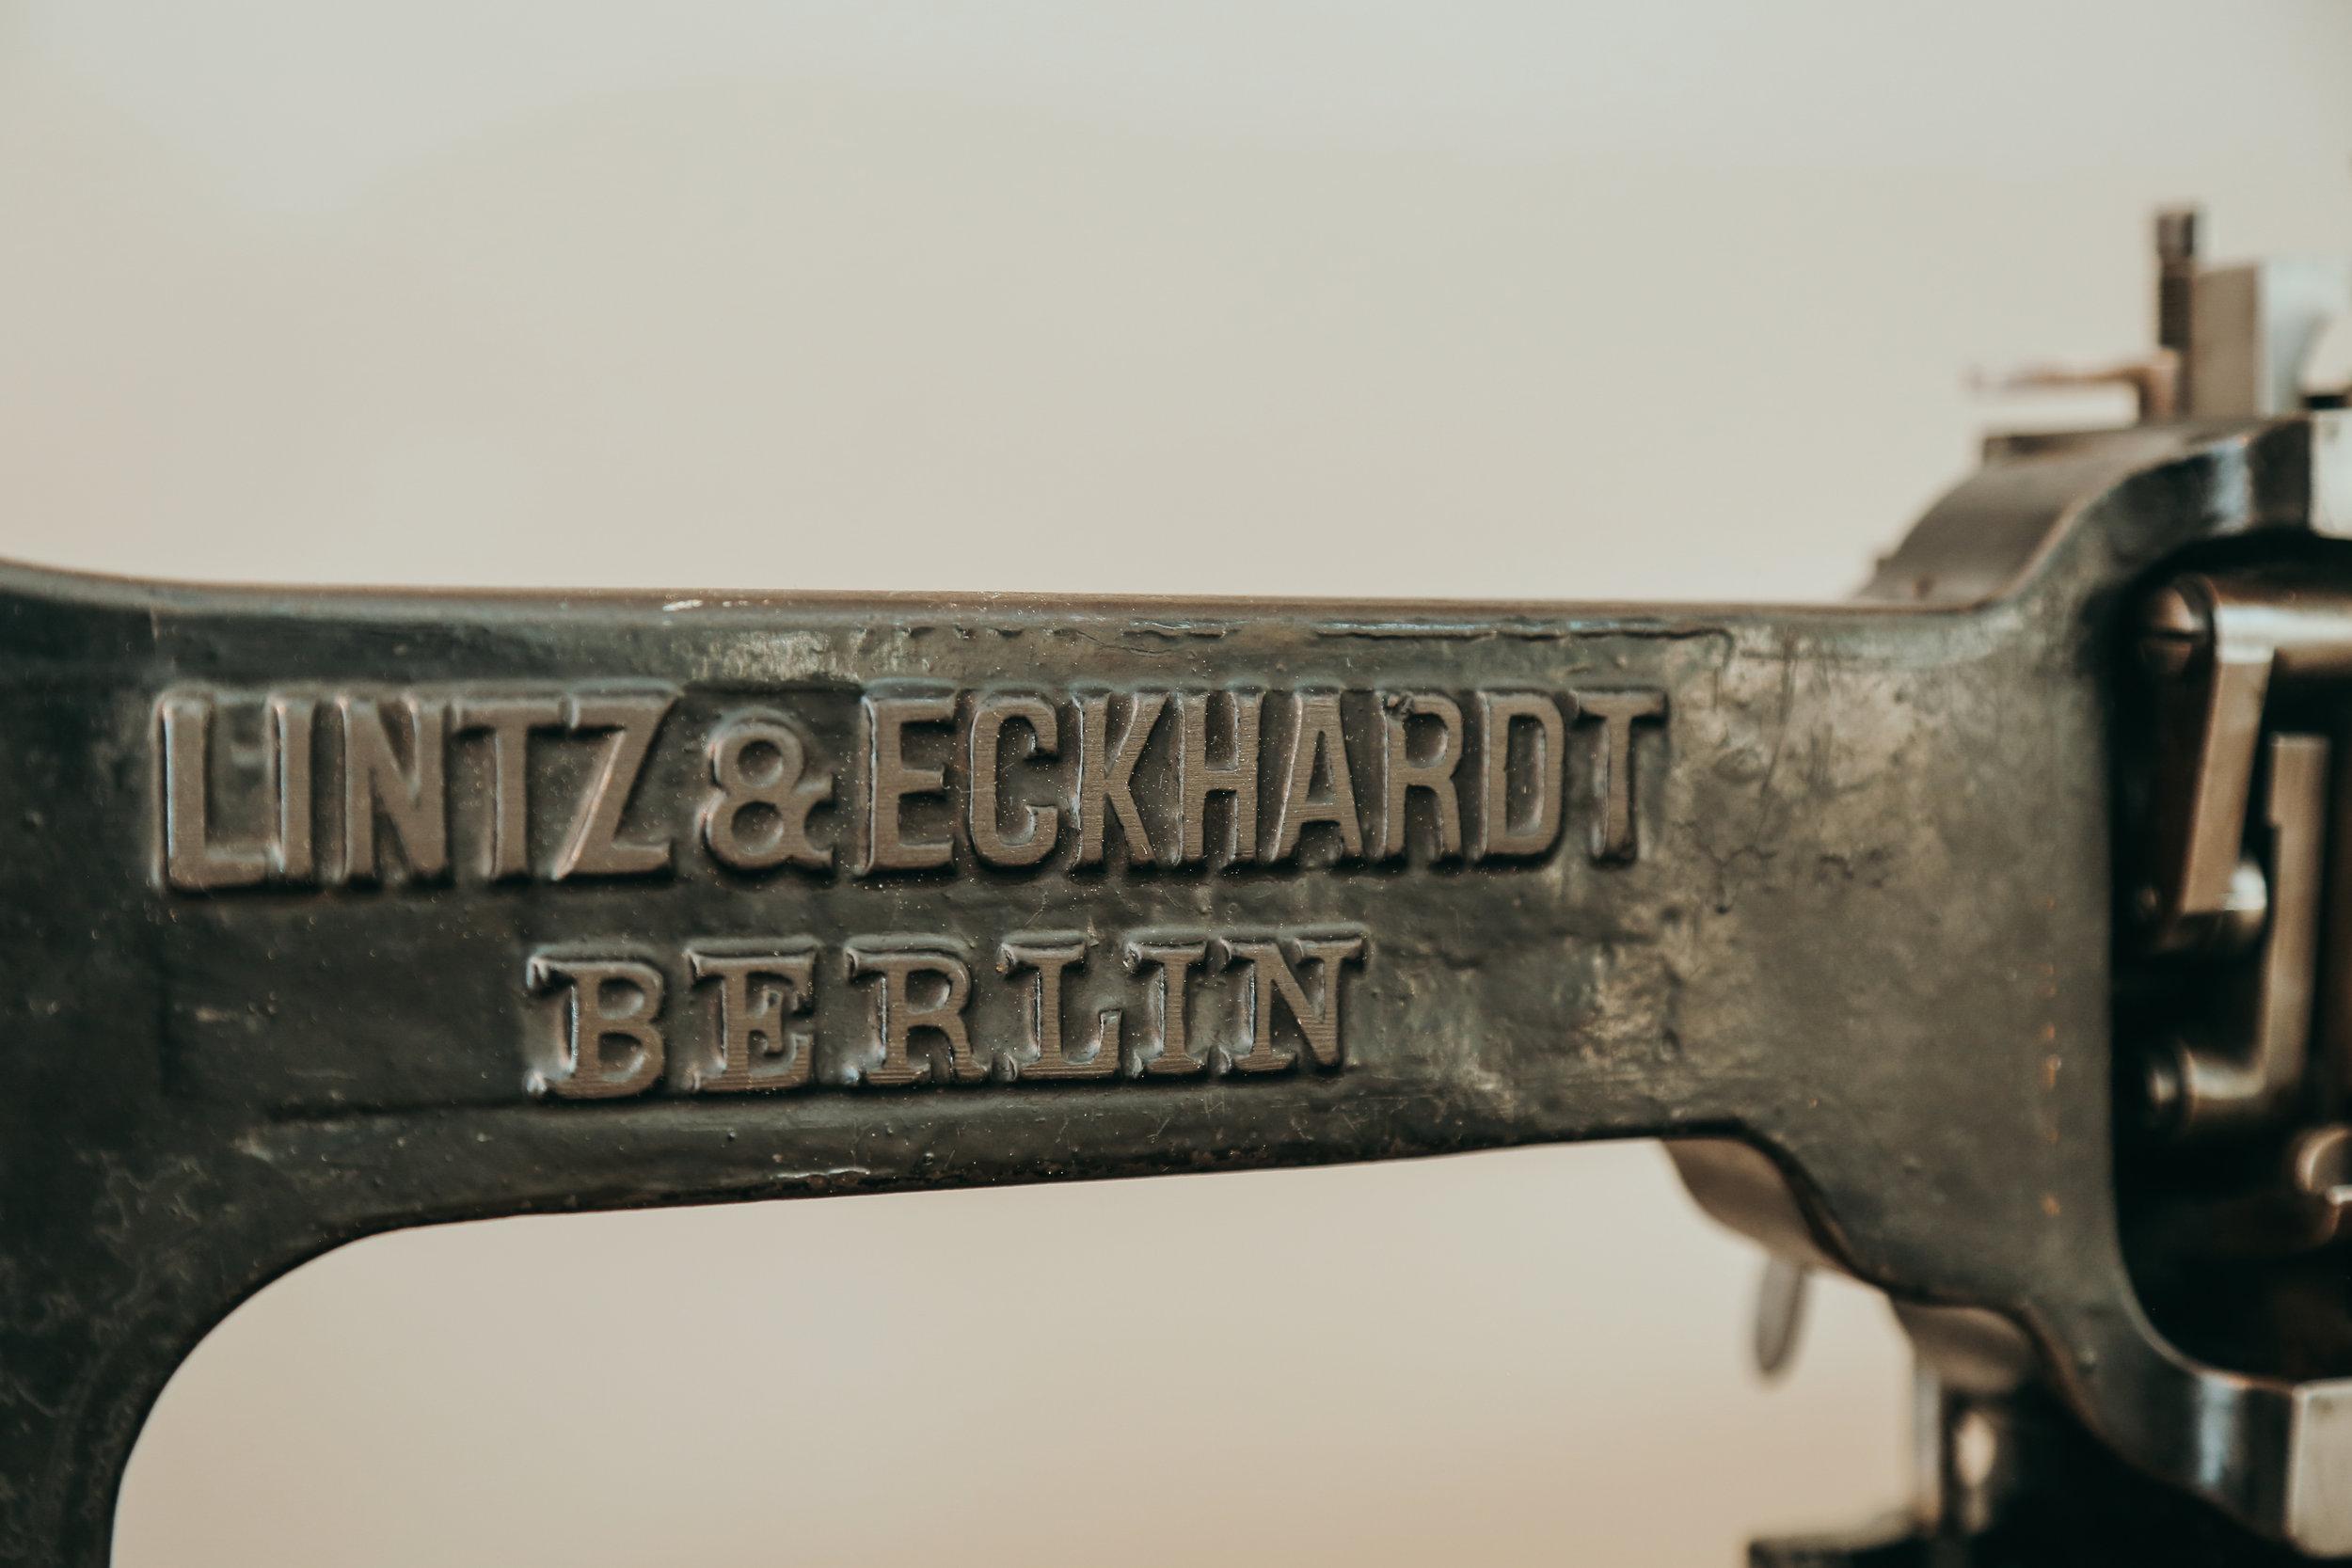 Chainstitch Machine Lintz&Eckhardt Berlin Lintz Eckhardt Saintchains Cornely K A Singer Closeup Chain Stitch